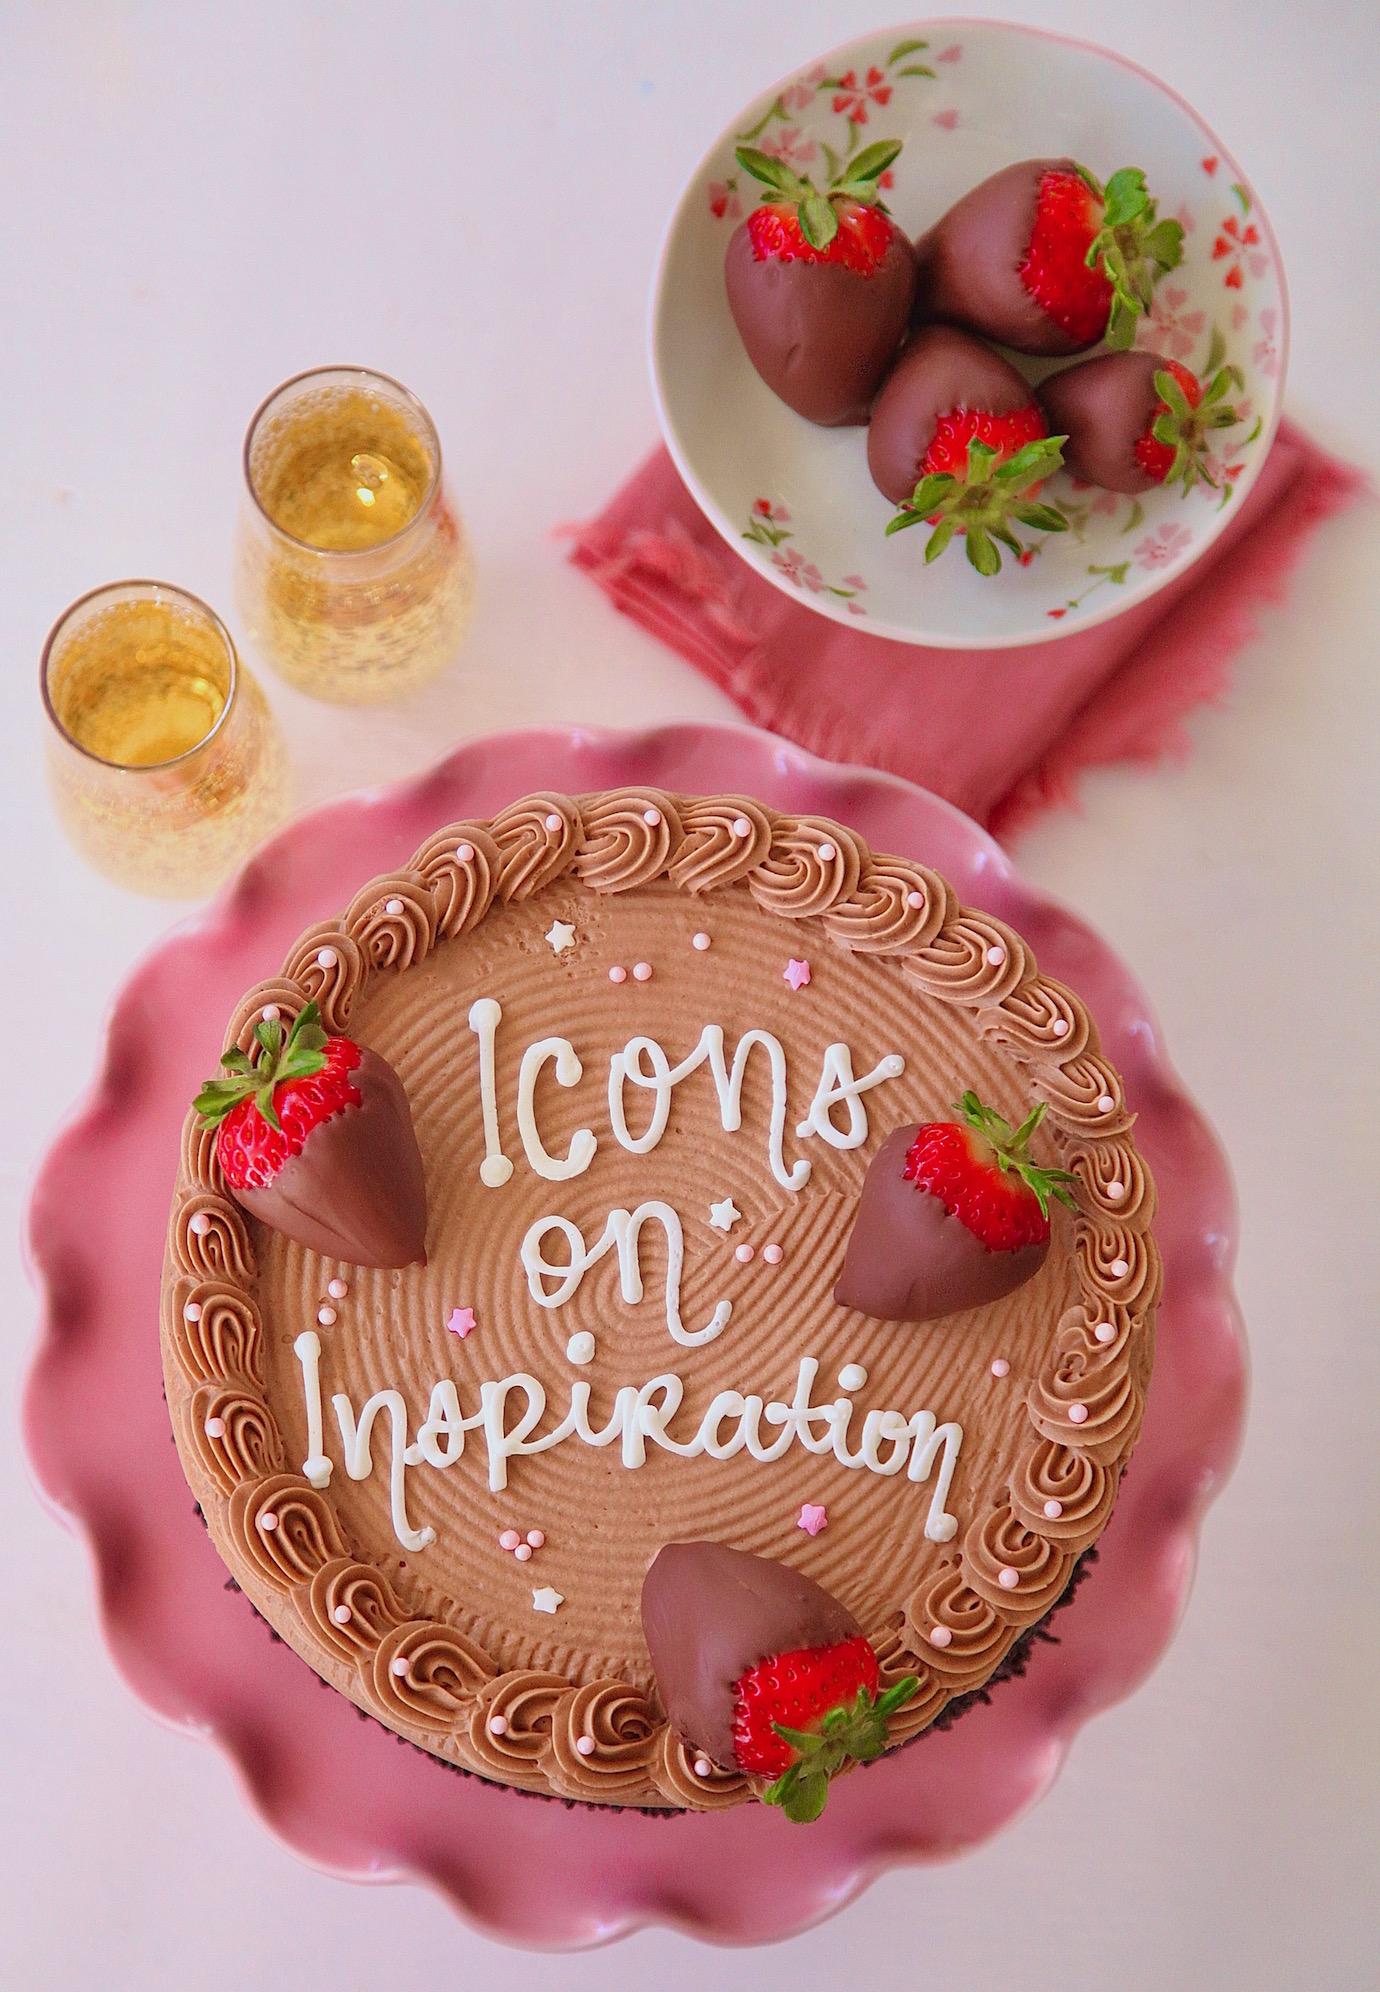 Icons On Inspiration Chocolate Cake